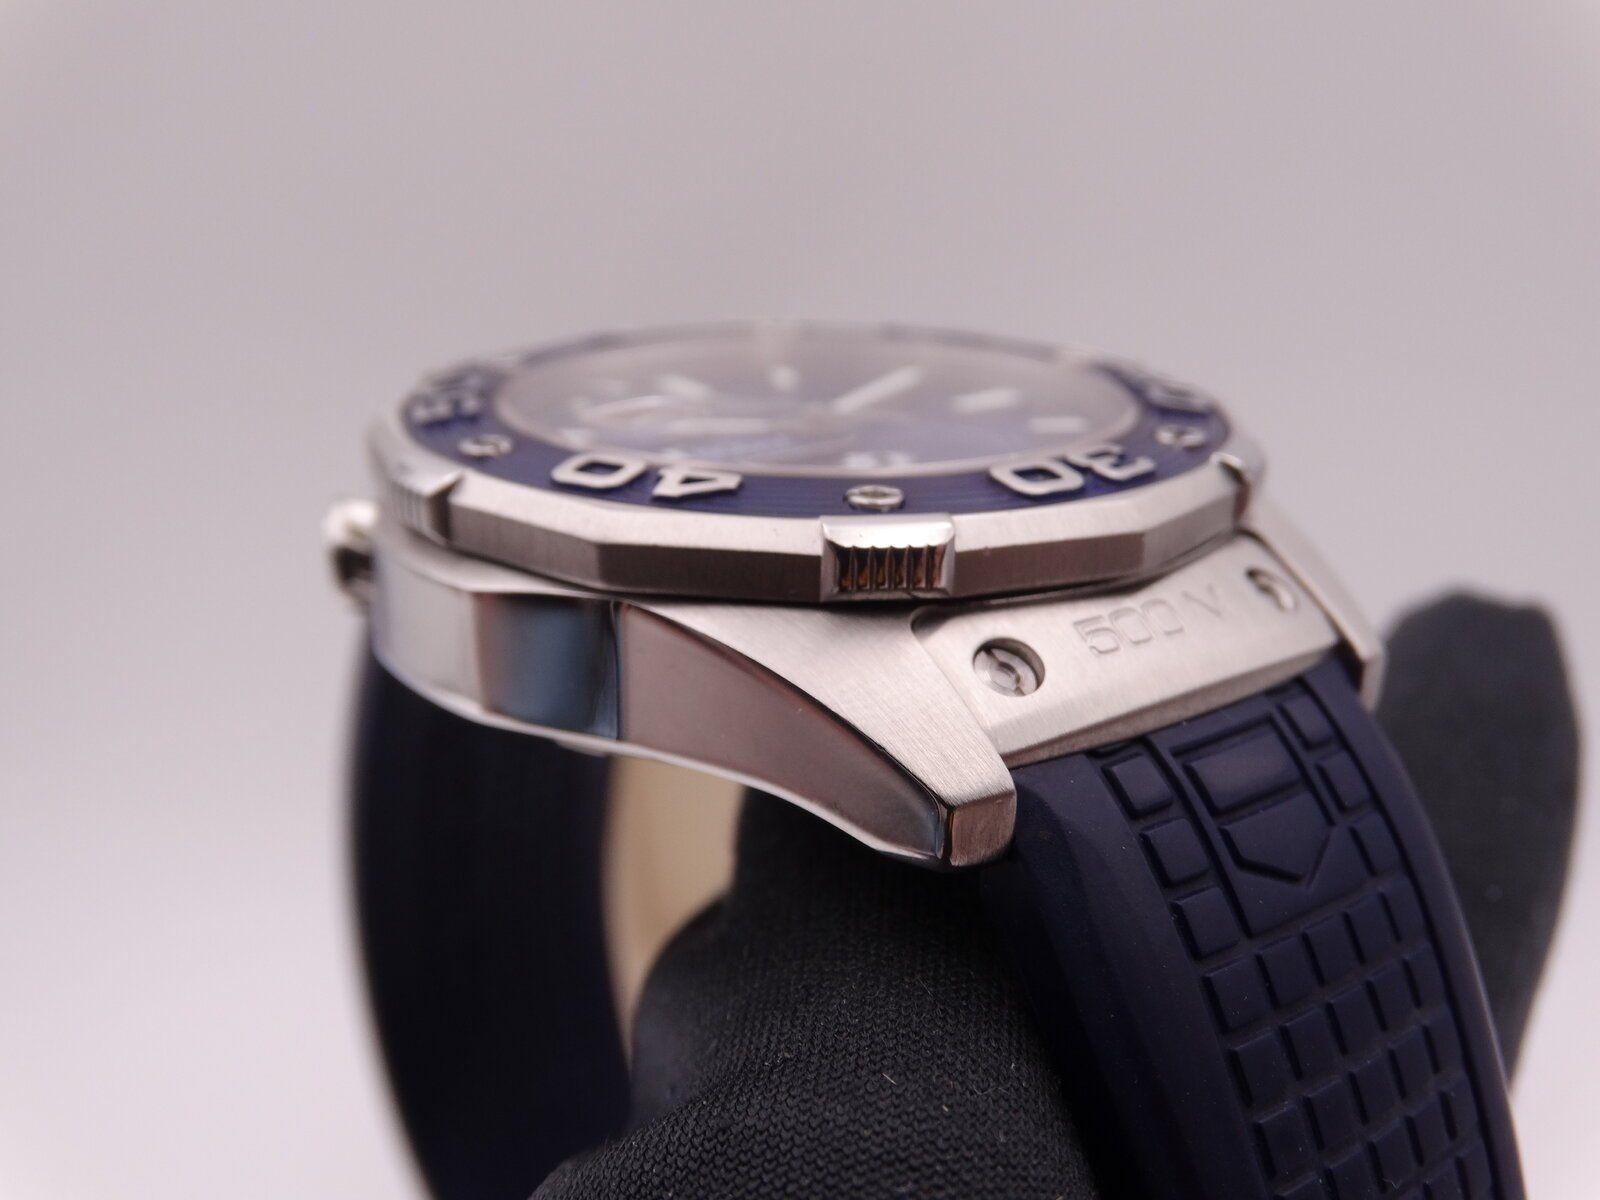 Tag Heuer Aquaracer 500 Dicaprio Green cross Blue Limited 01265.JPG